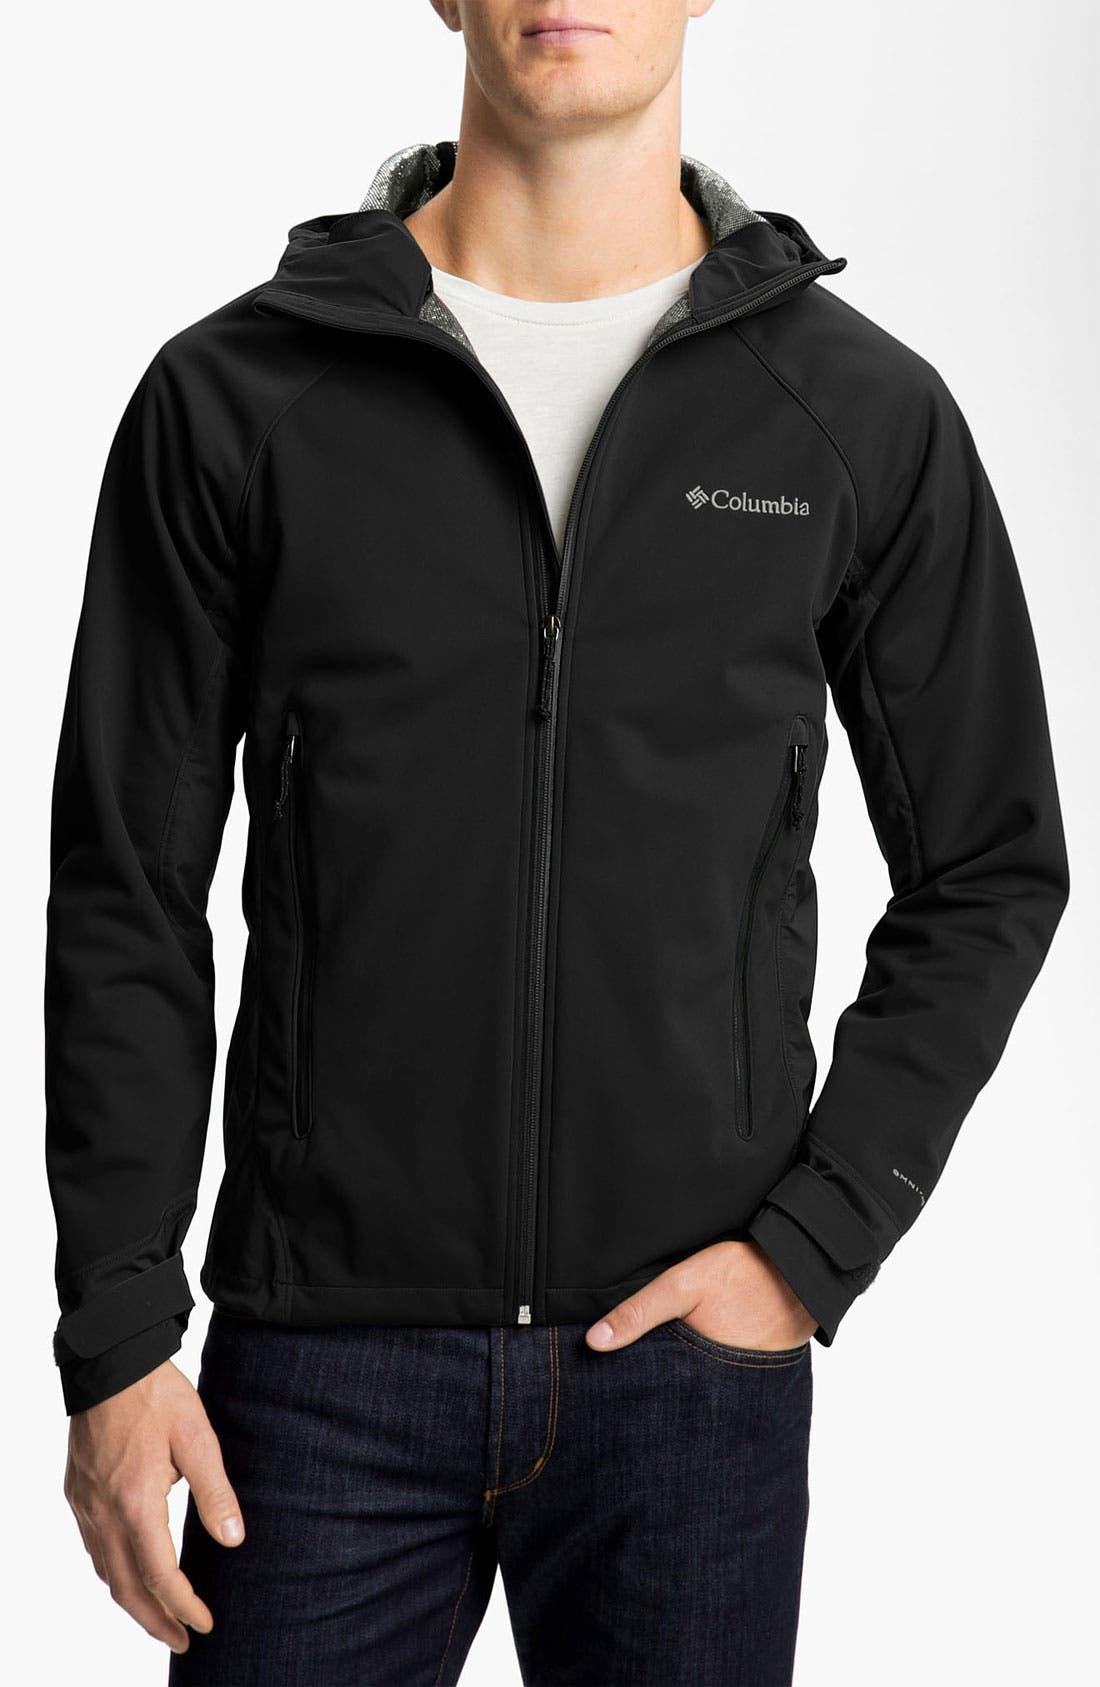 Main Image - Columbia 'Triteca' Soft Shell Jacket